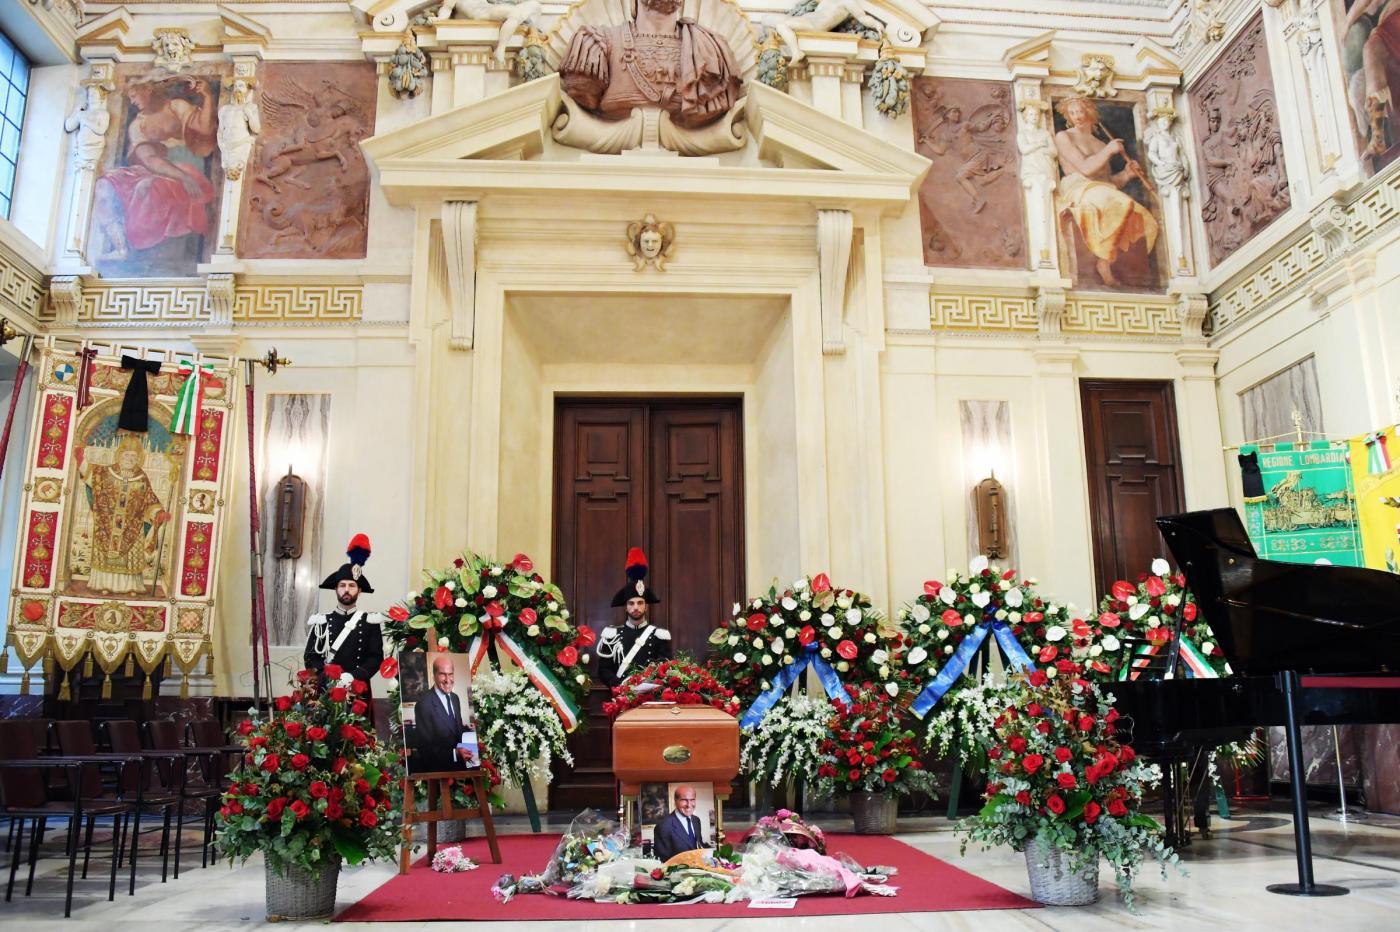 Funerale di Umberto Veronesi a Milano